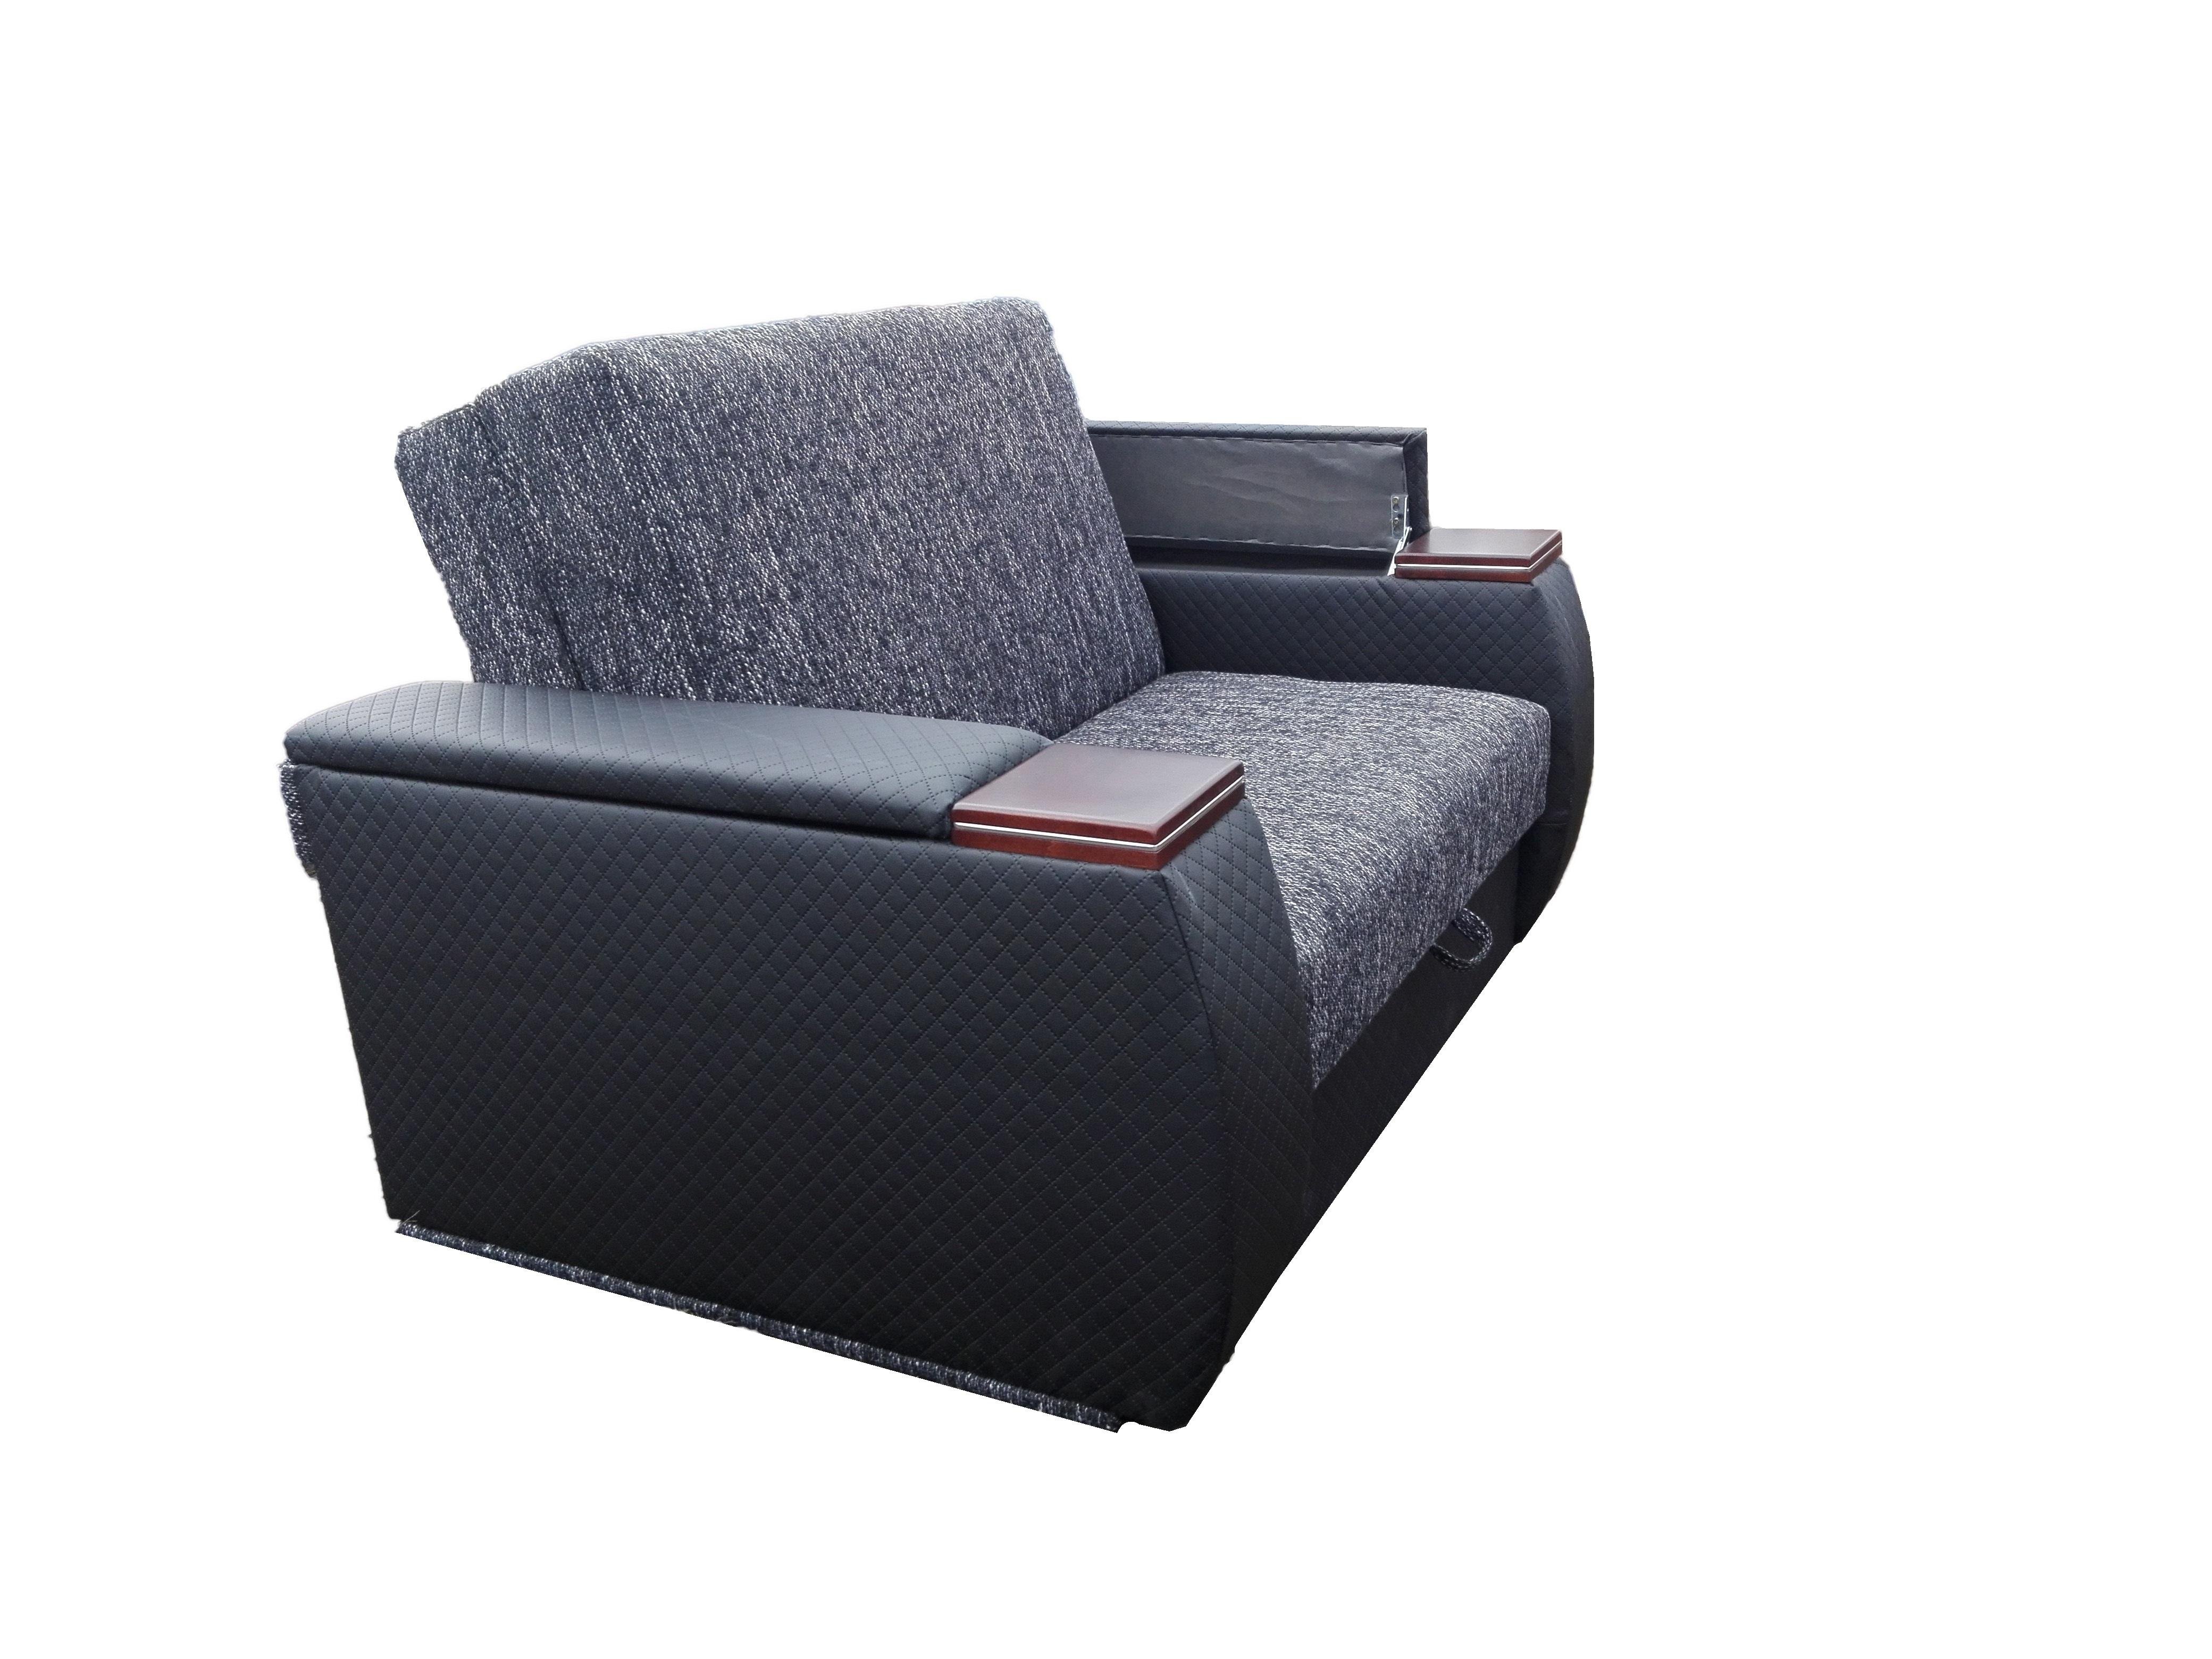 Jednoosobowa amerykanka sofa malaga for Sofas malaga